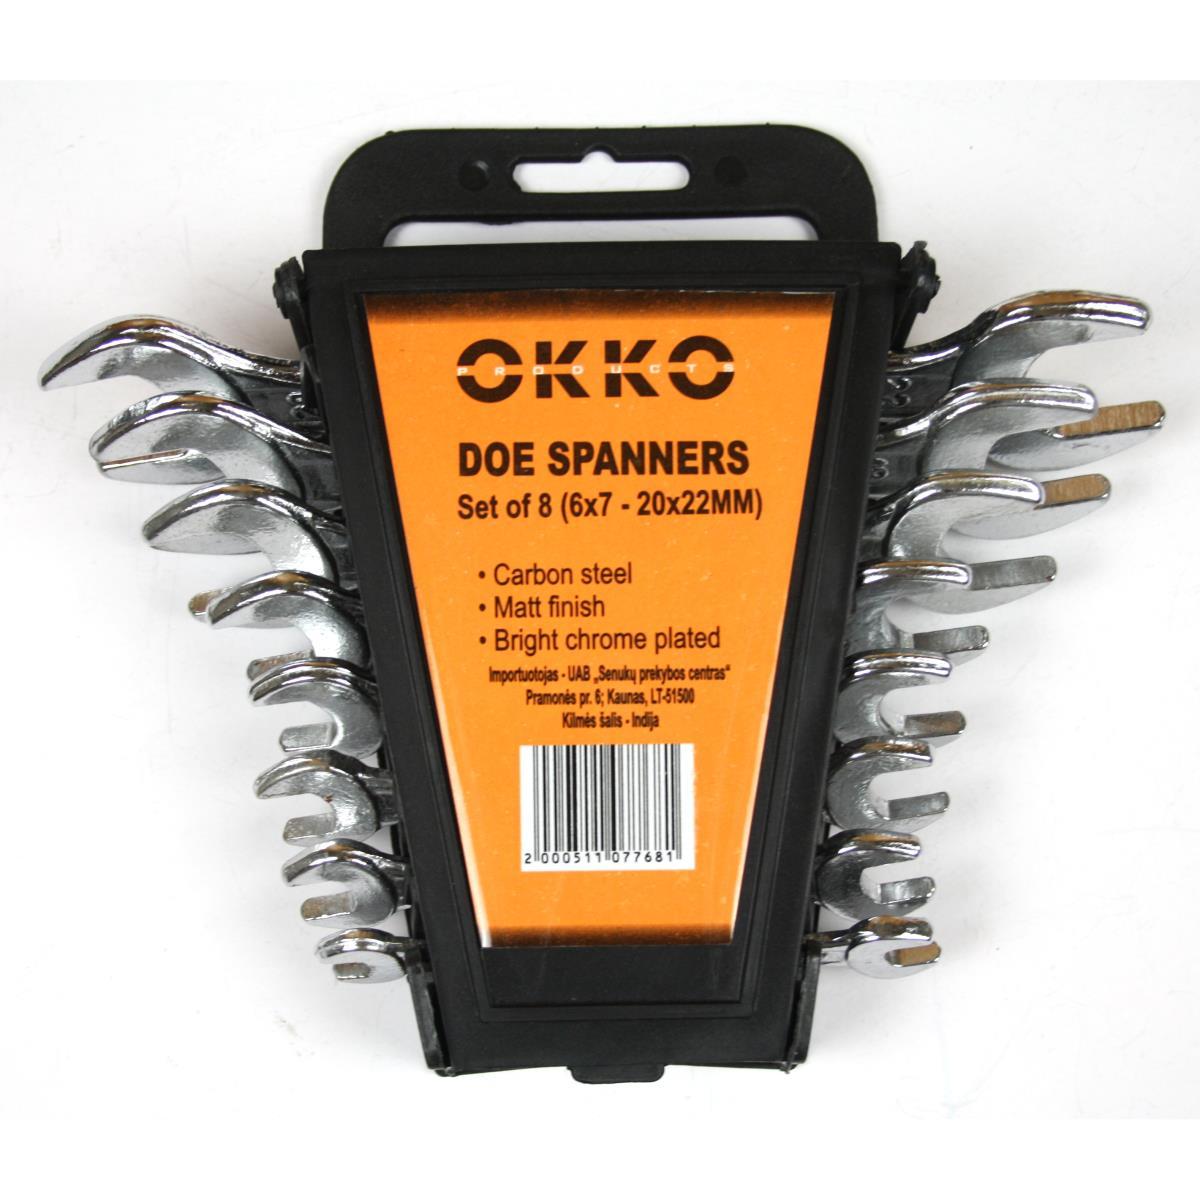 Okko 8 teiliges Schlüssel Maulschlüssel Maul Set 6 x 7mm - 20 x 22 mm,Okko,2000511077681, 2000511077681